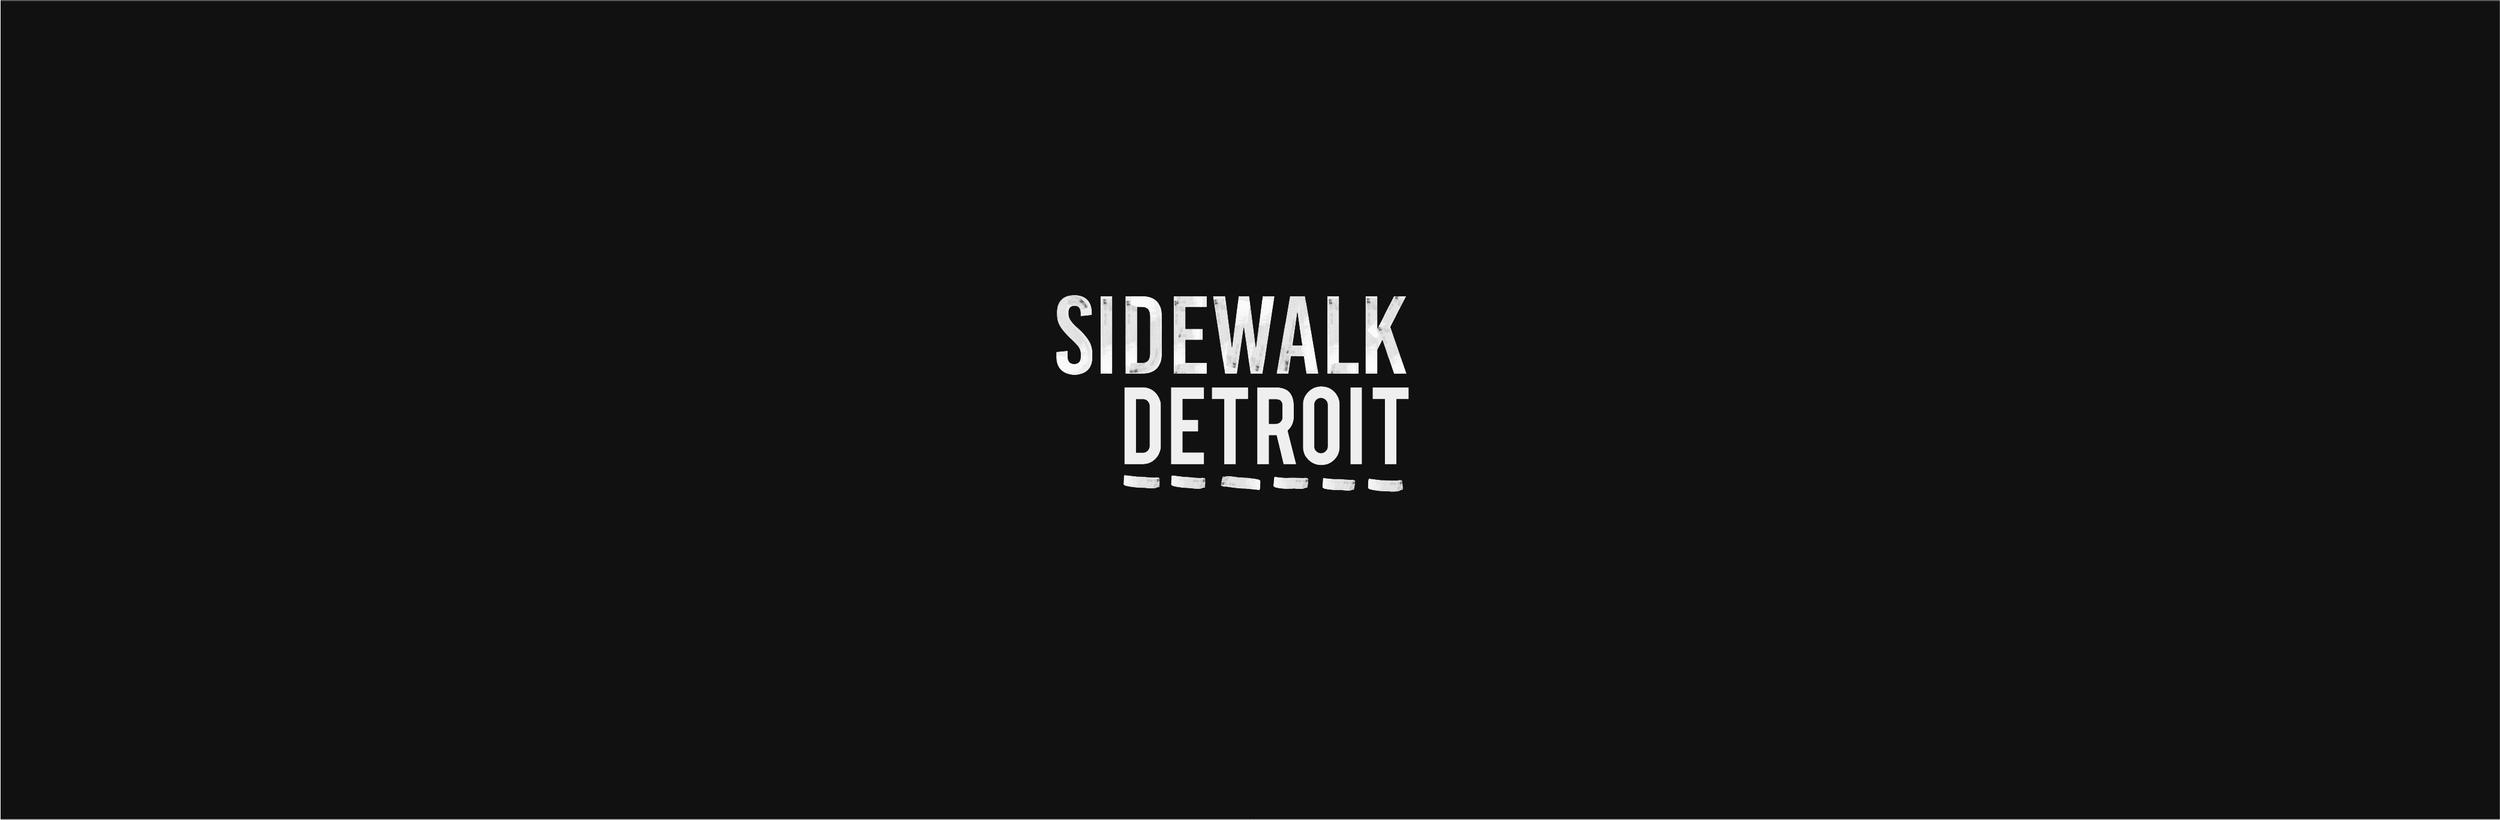 SidewalkDetroit4.png